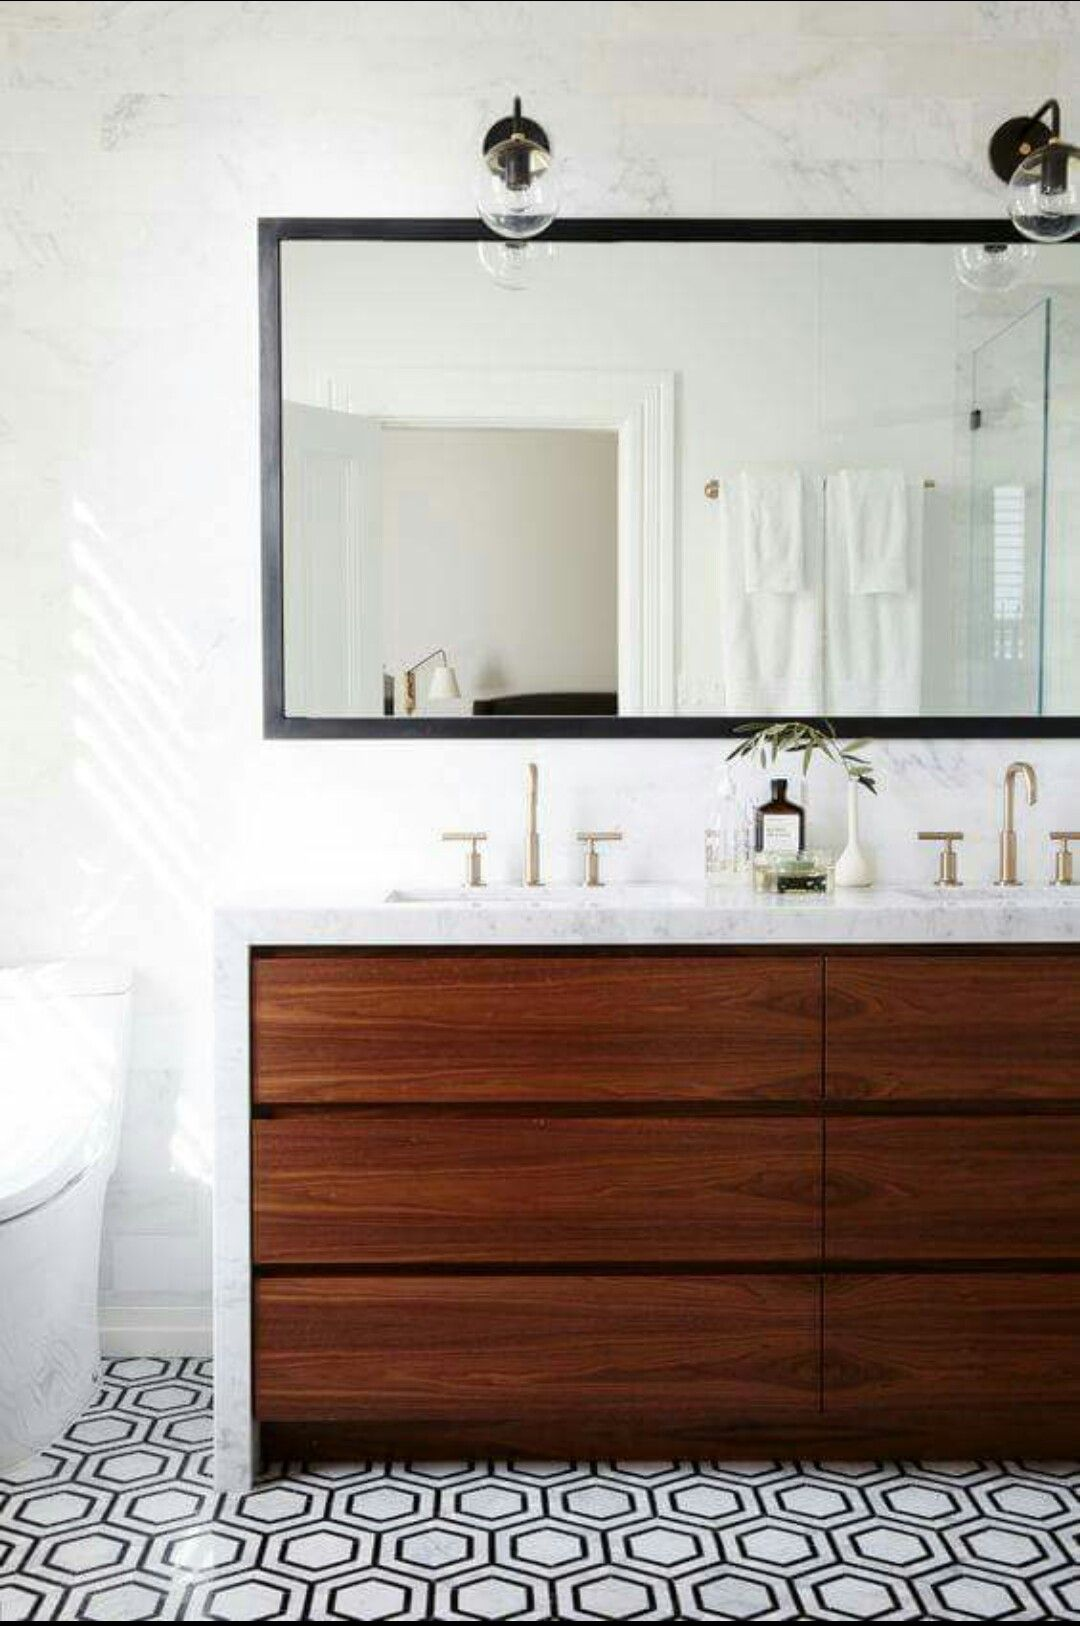 Pin by Lisa Brown on Bathroom | Pinterest | Bathroom interior design ...